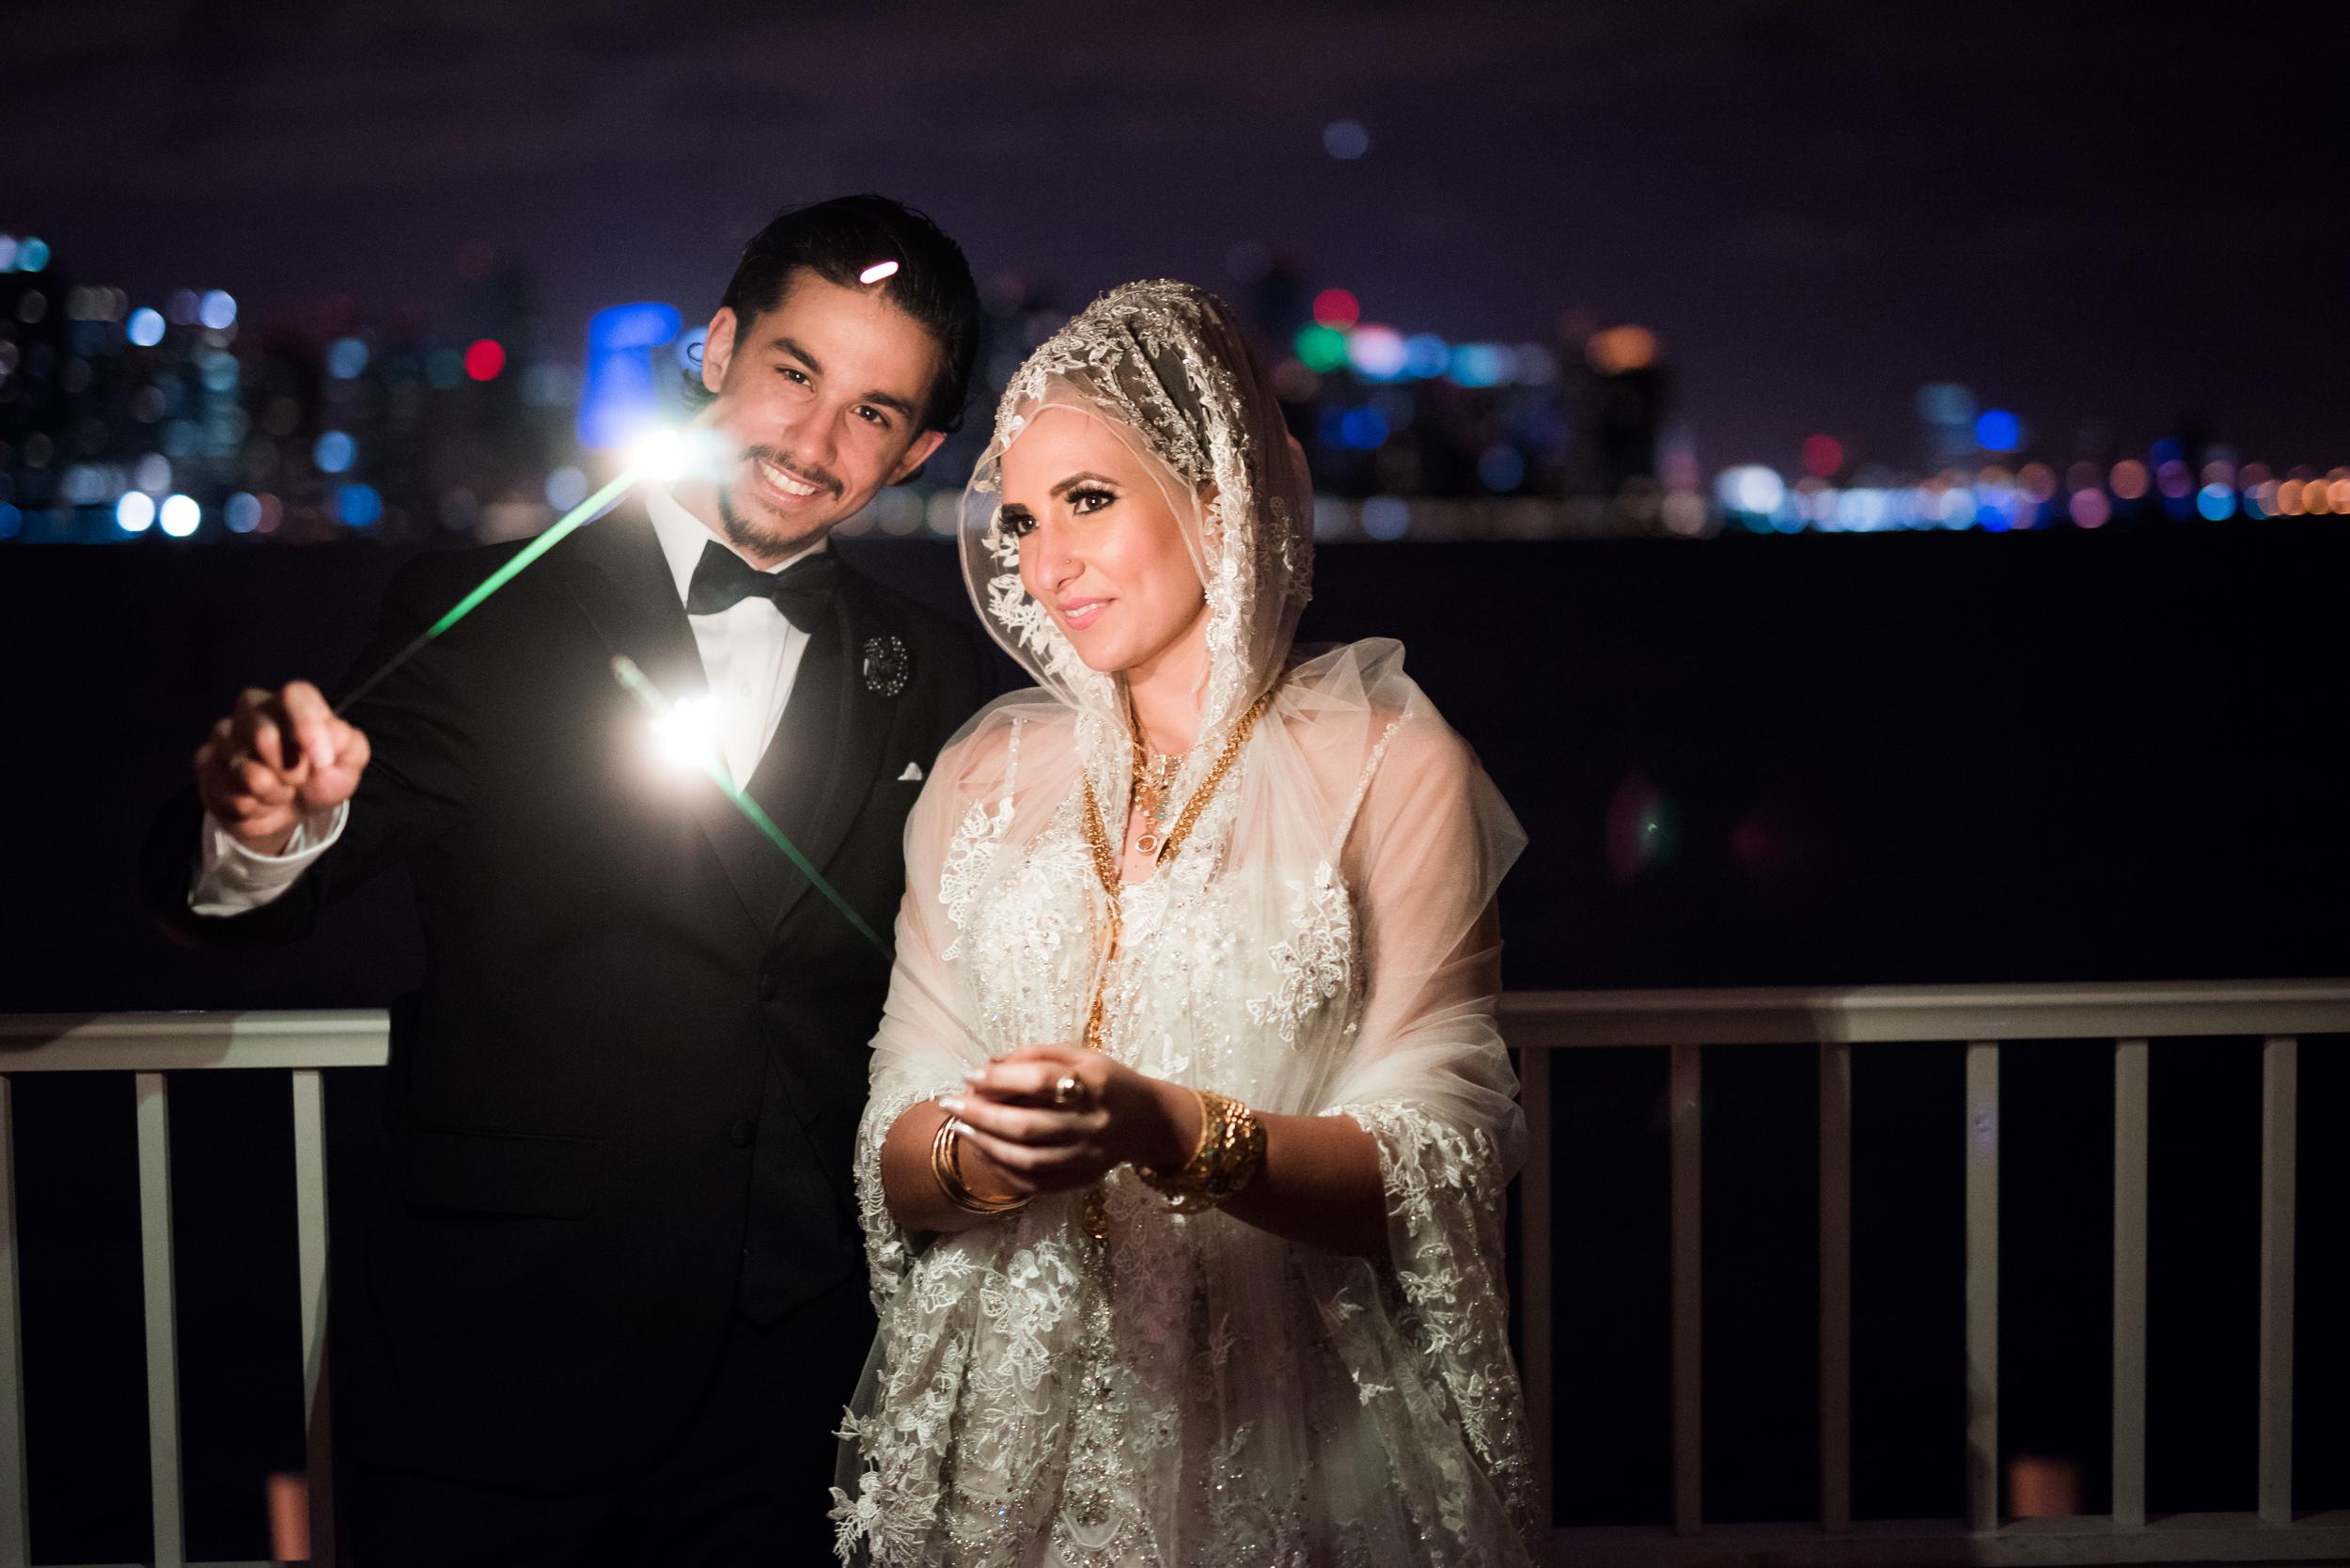 Suzannes & Omar's Wedding | Highlights-0105.jpg